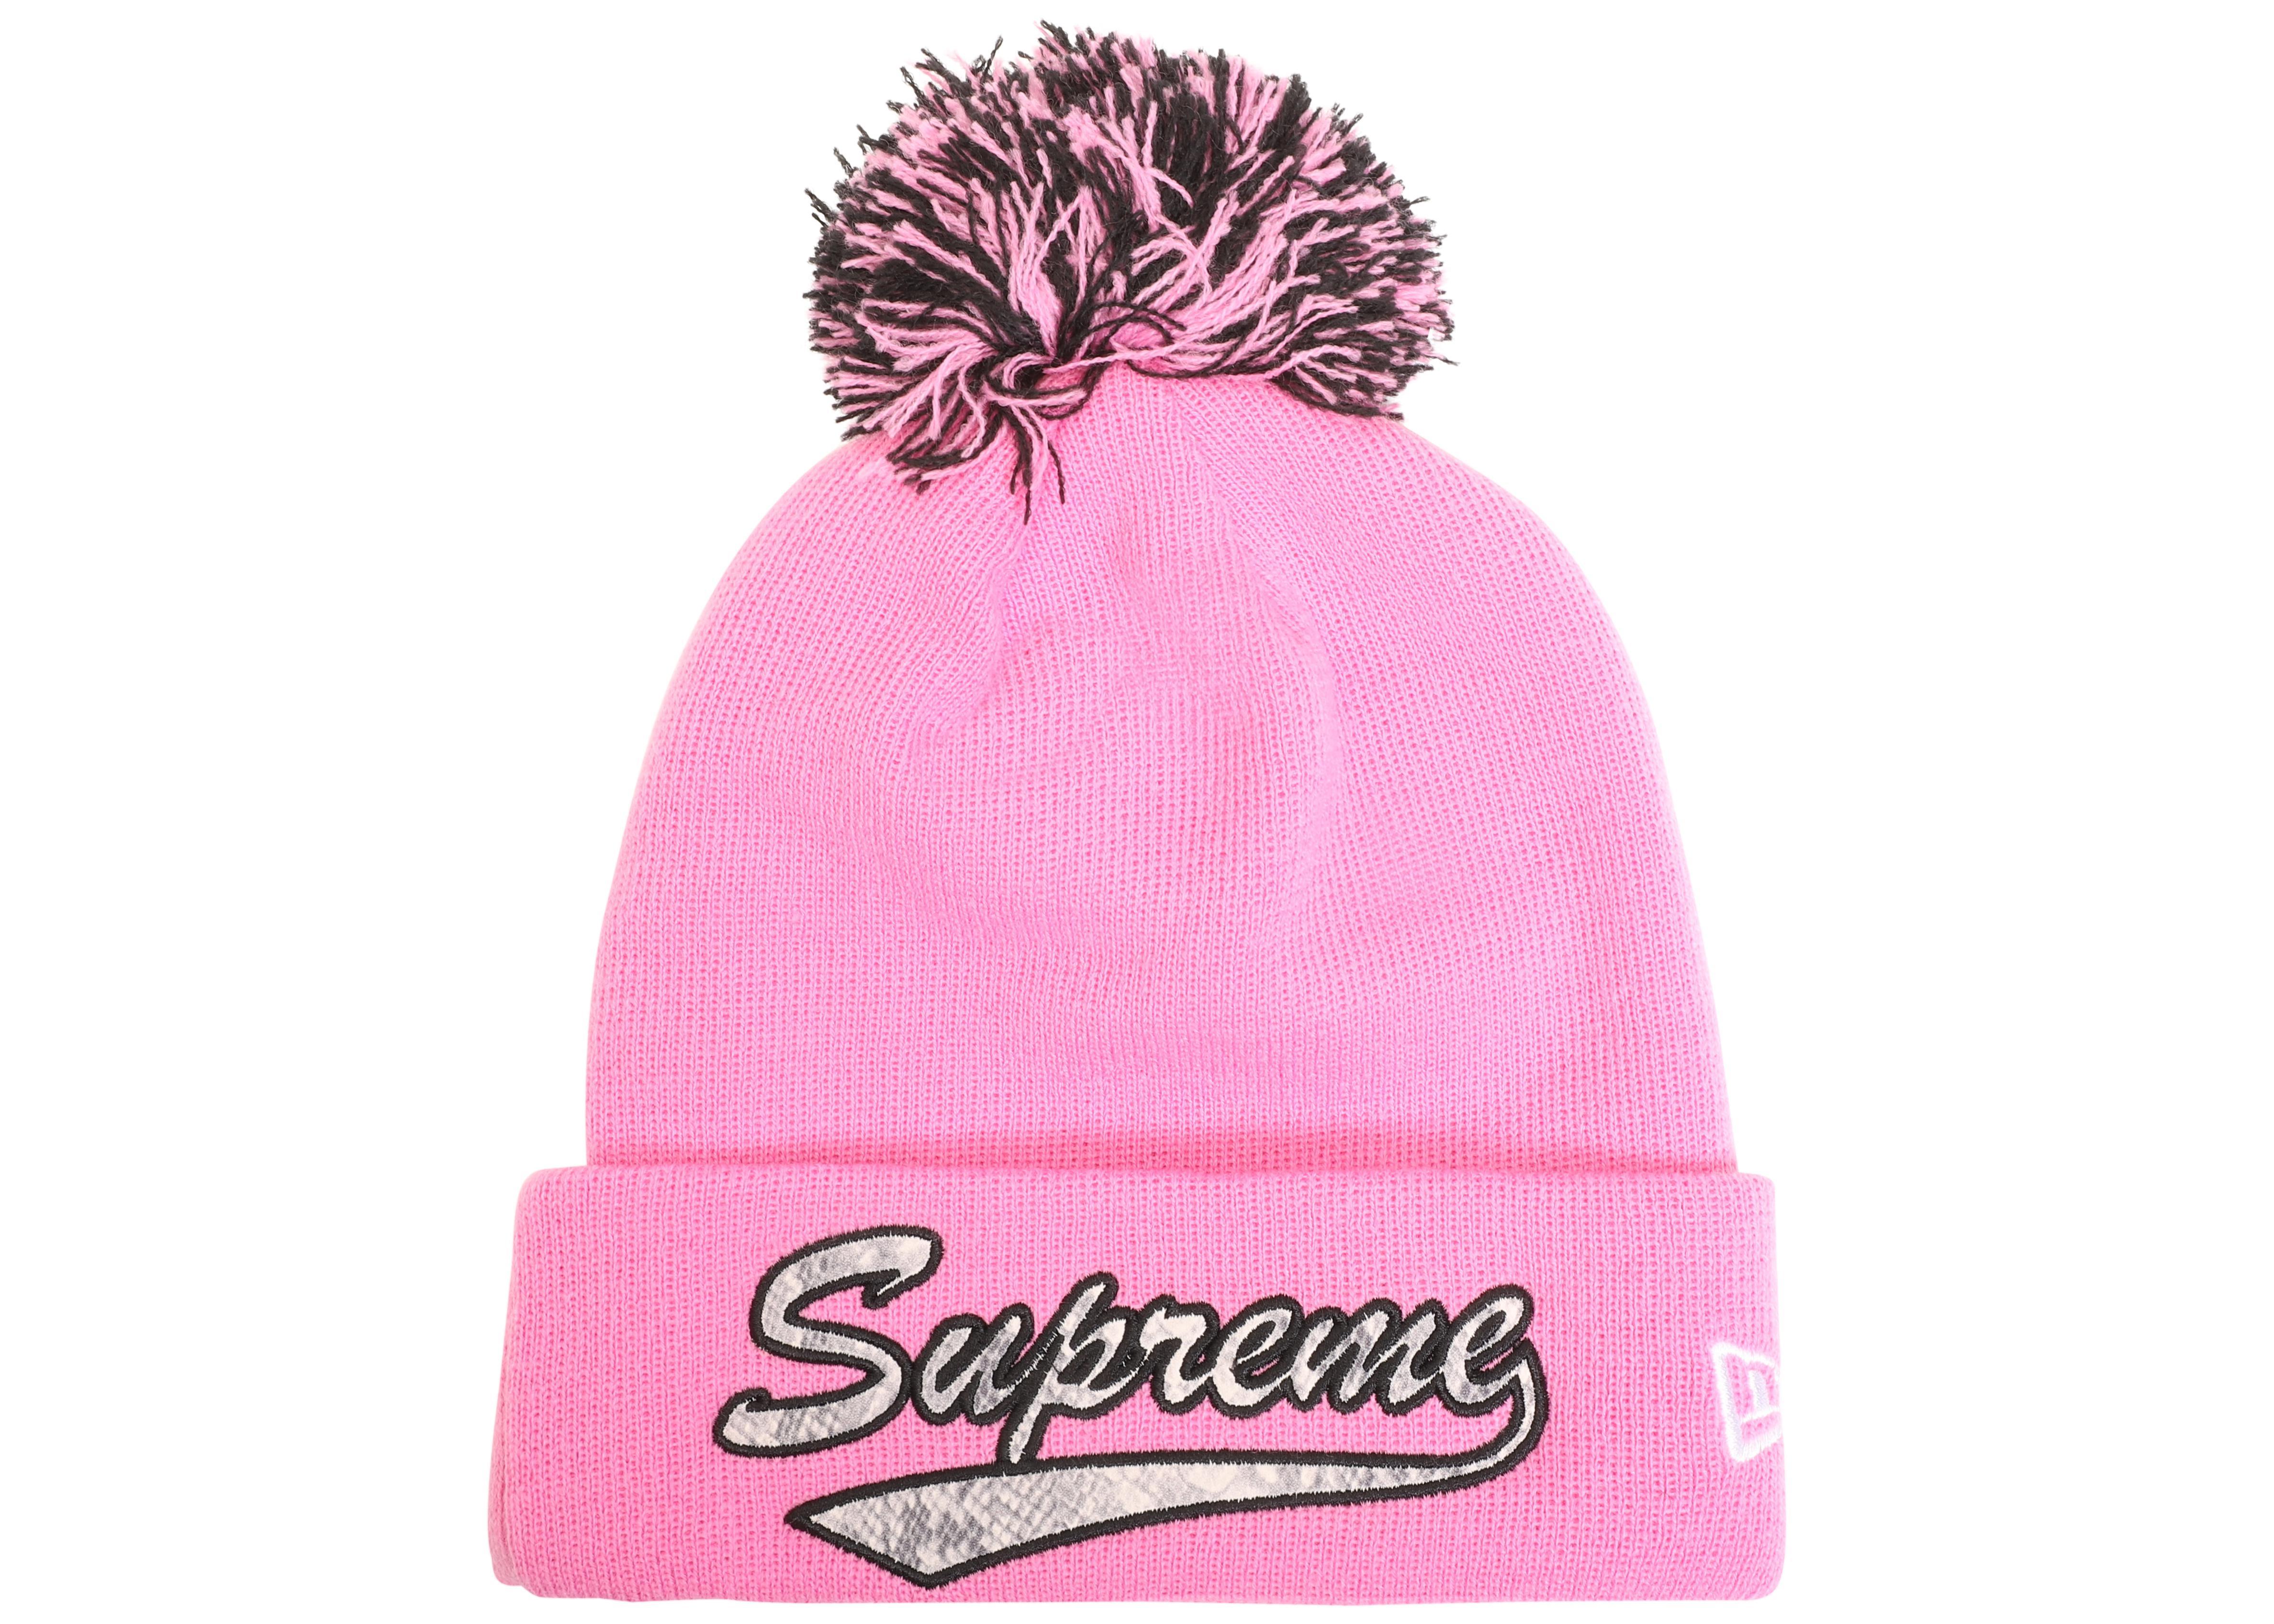 369bbcb4281 Lyst - Supreme New Era Snake Script Beanie Pink in Pink